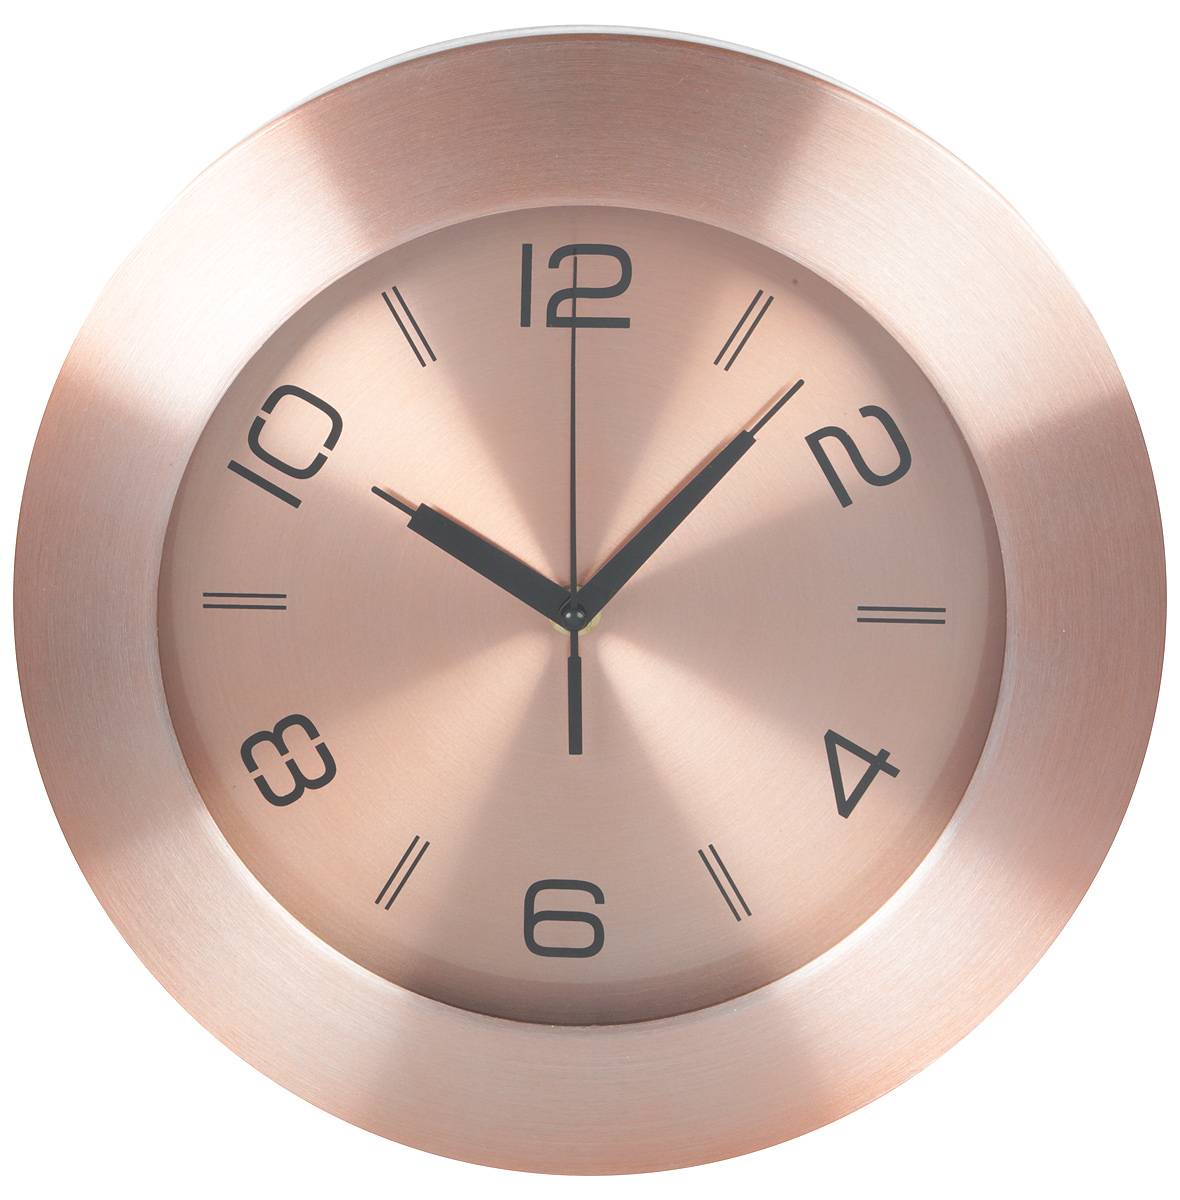 Часы настенные Arte Nuevo, диаметр 30 см